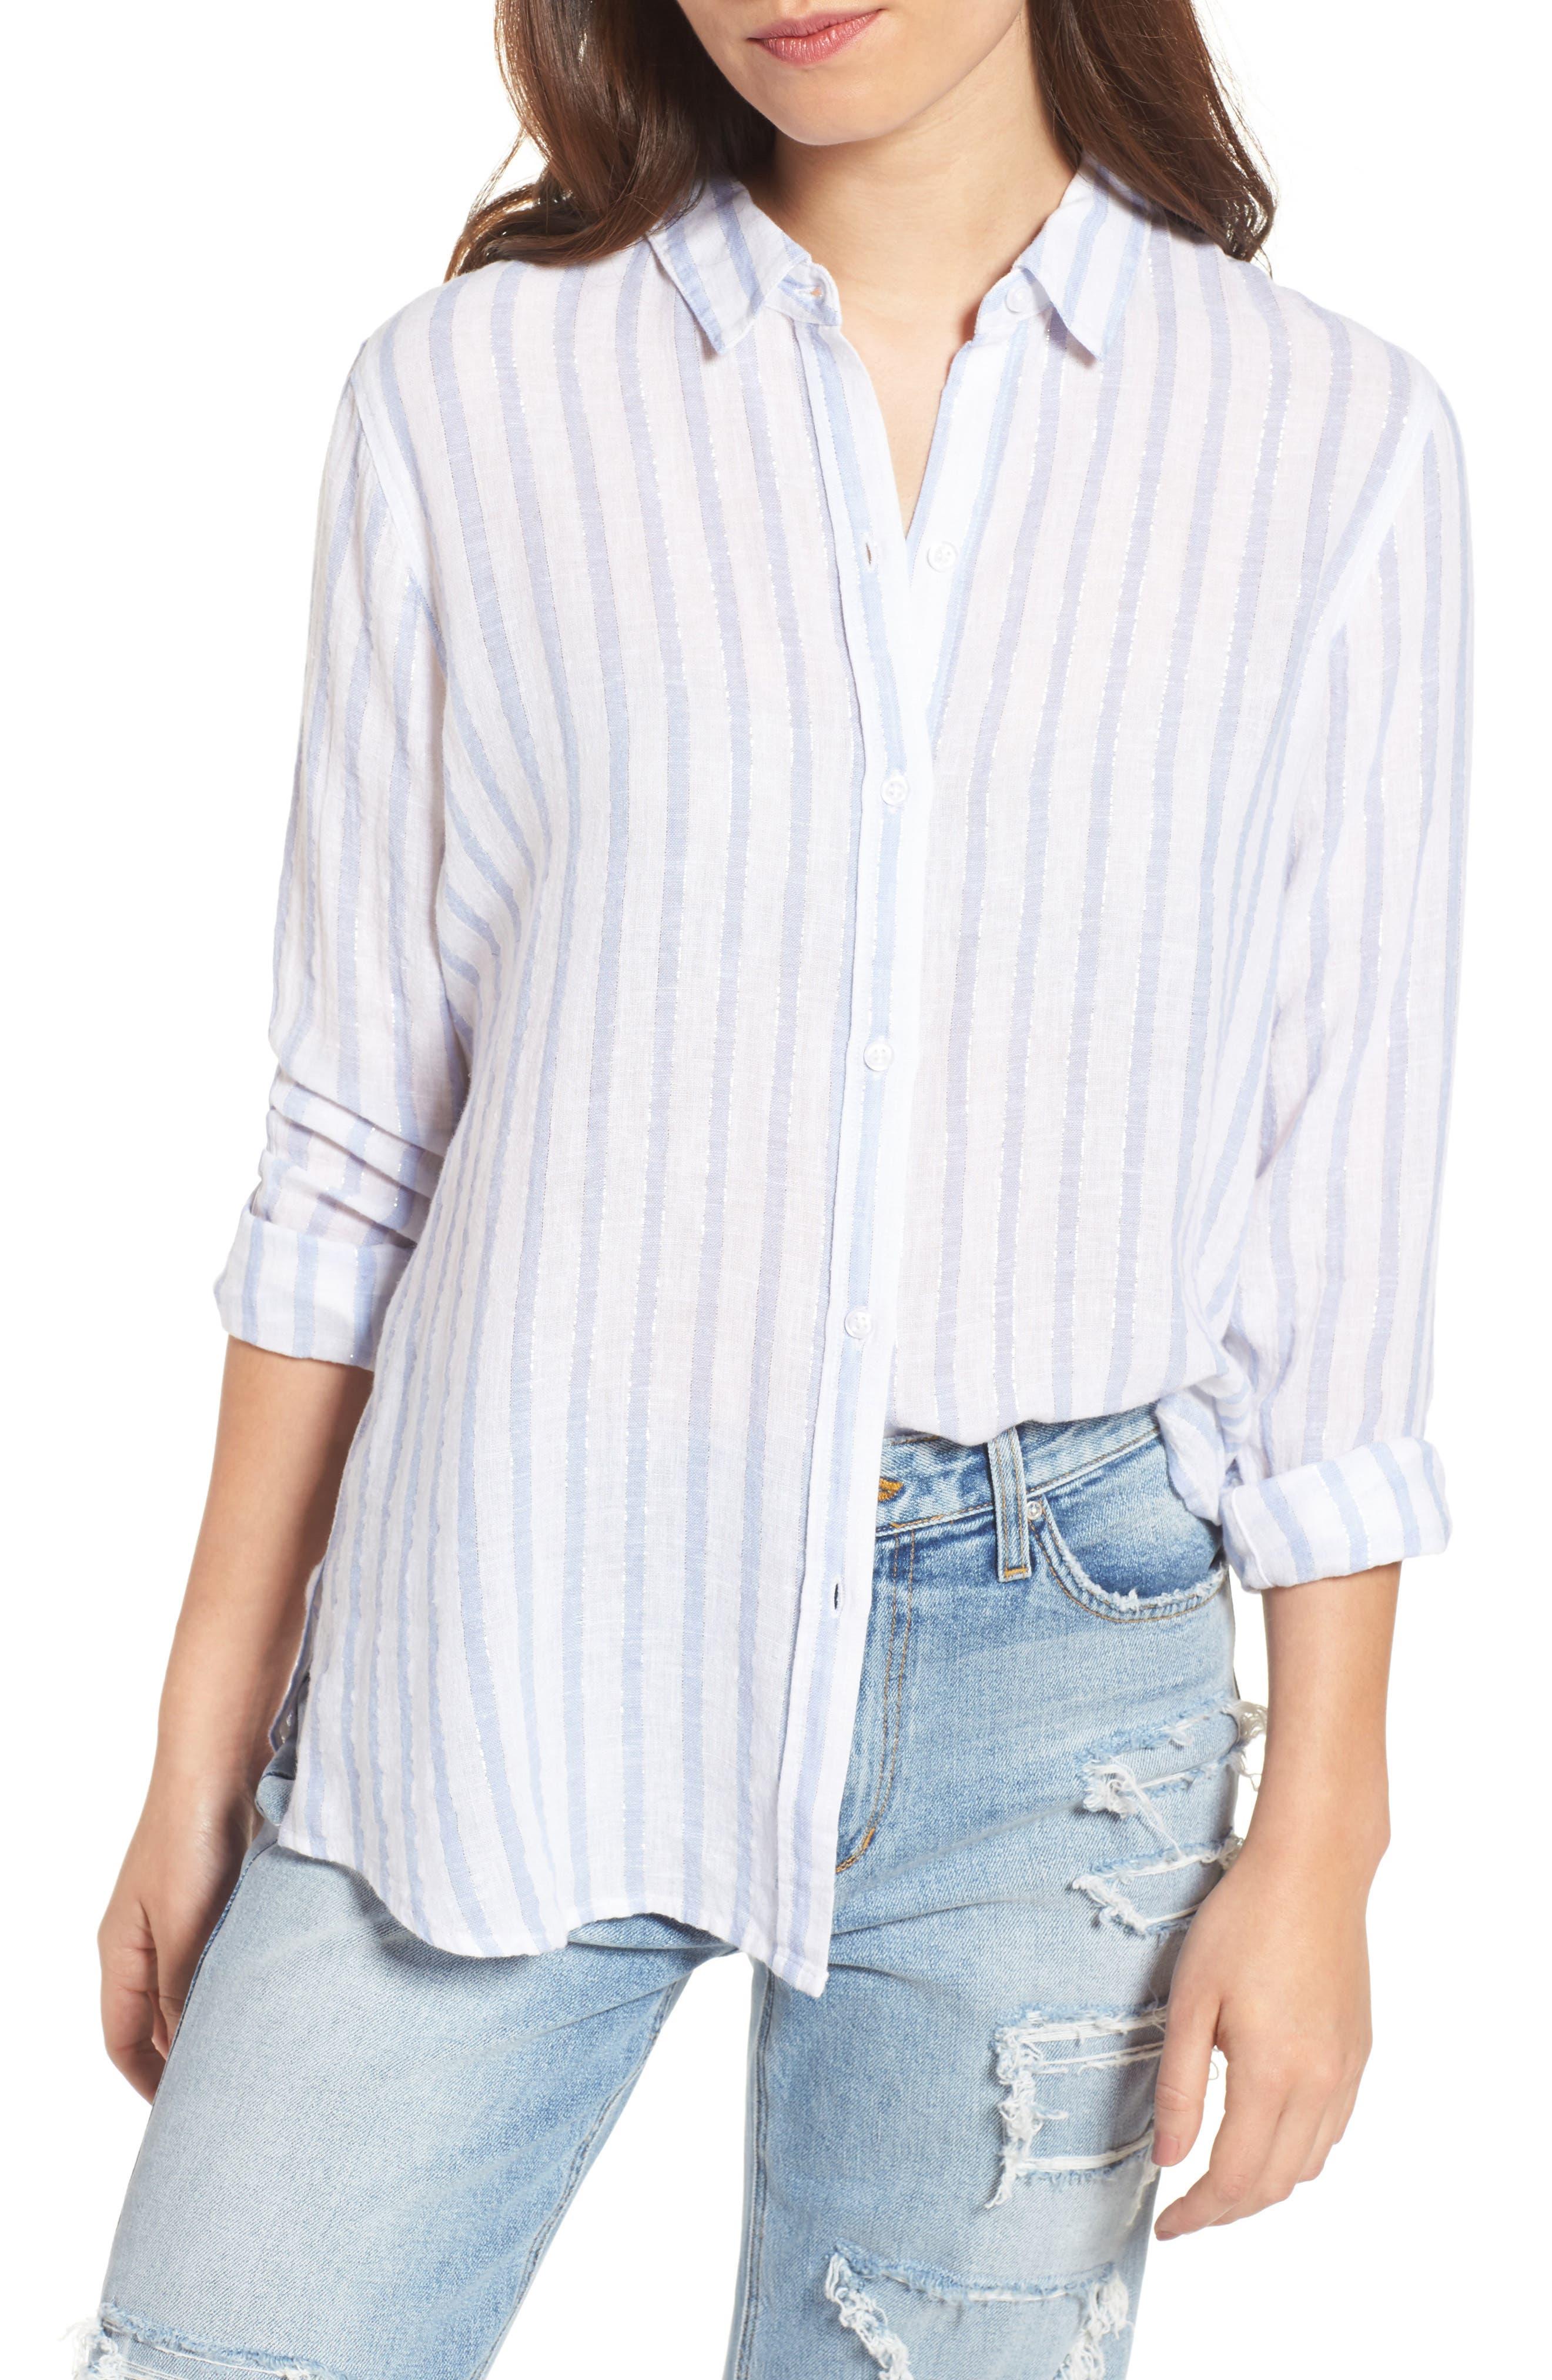 Sydney Vertical Shimmer Stripe Linen Blend Shirt,                         Main,                         color, Cornflower Stripe/ Silver